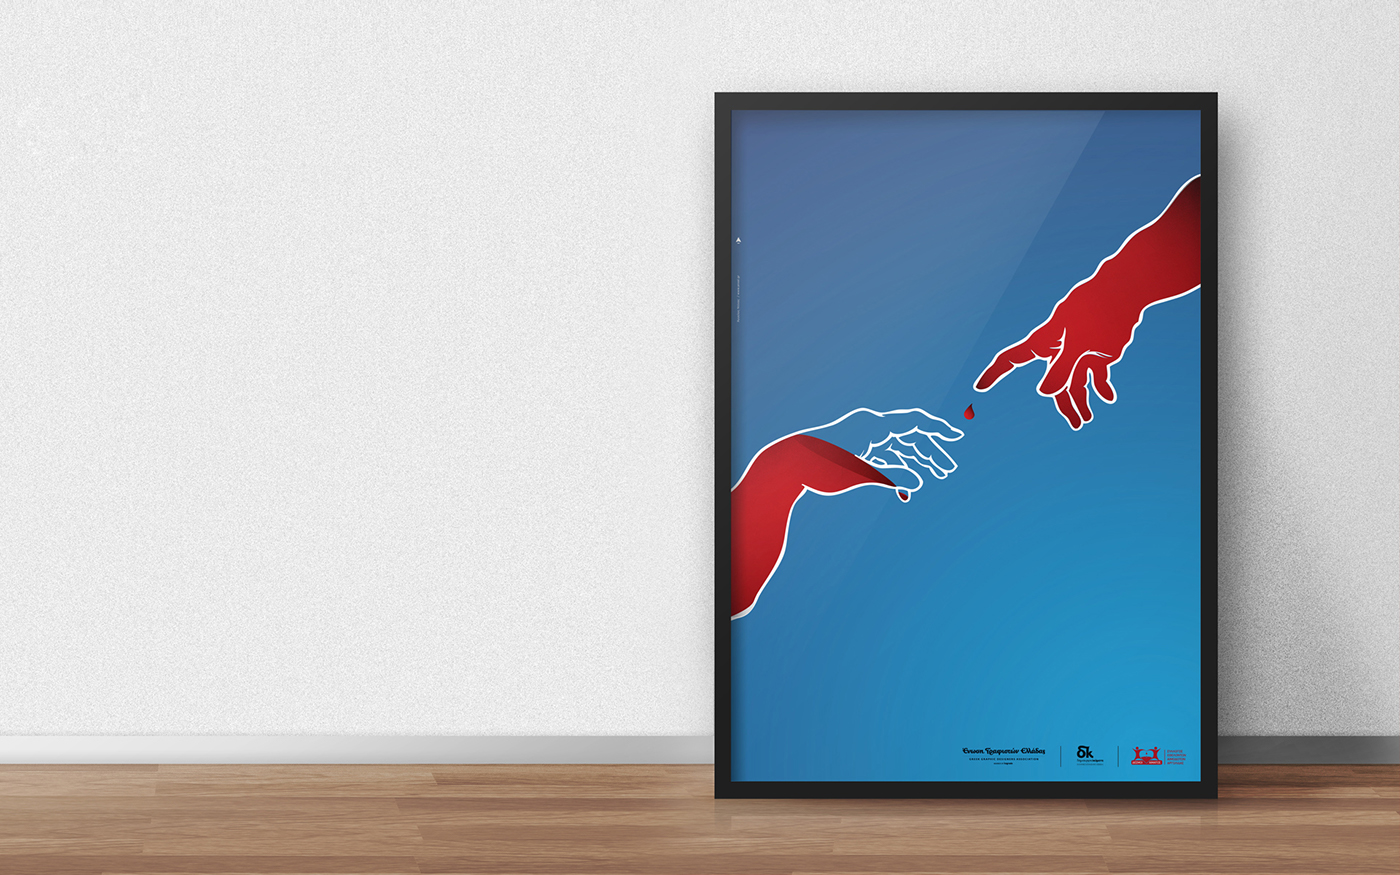 poster social design blood blood donation hands the hand of God Michelangelo